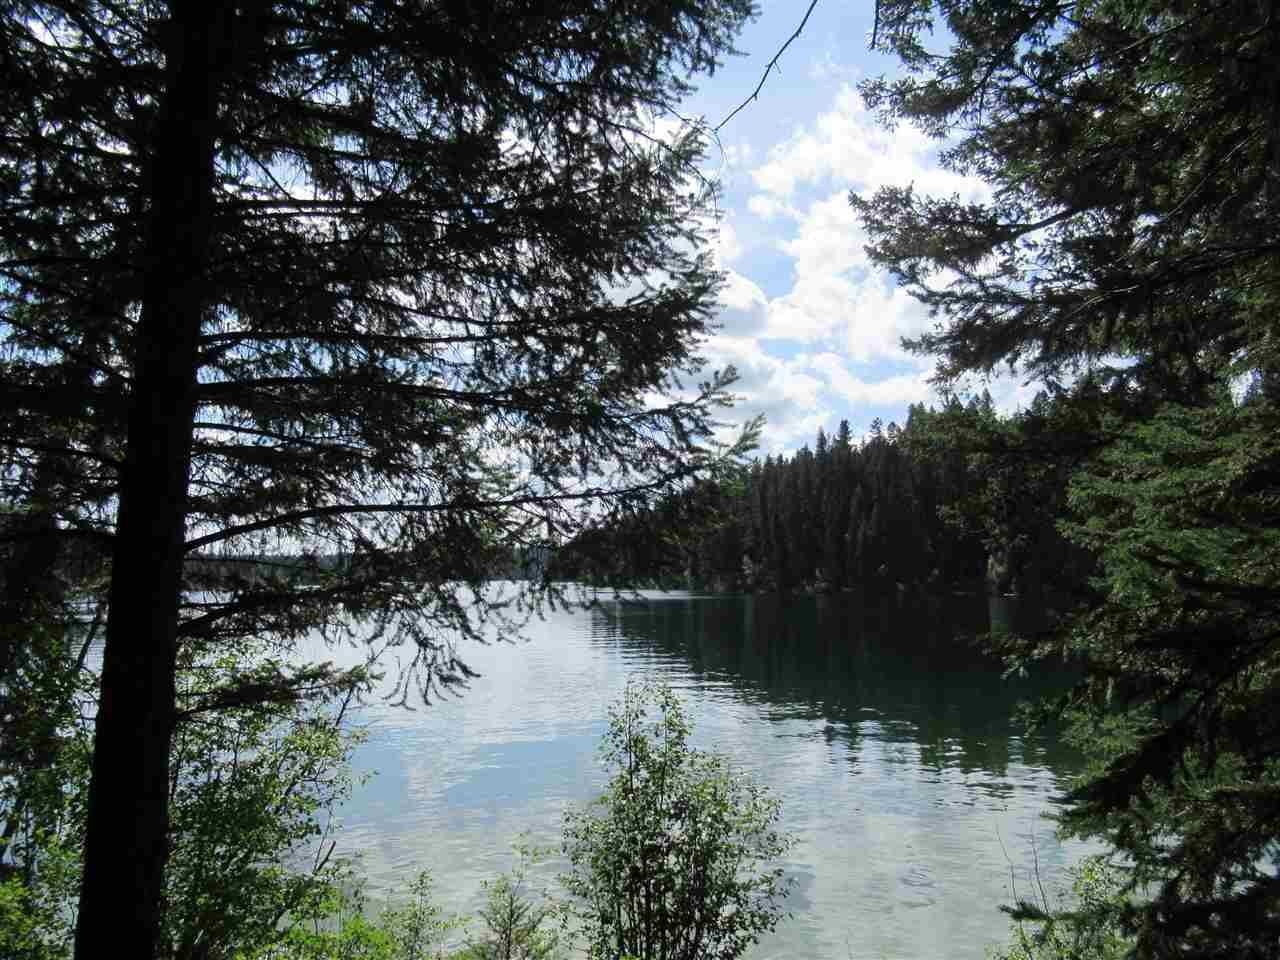 Photo 11: Photos: 2454 TYEE LAKE Road in Williams Lake: Williams Lake - Rural North House for sale (Williams Lake (Zone 27))  : MLS®# R2398466